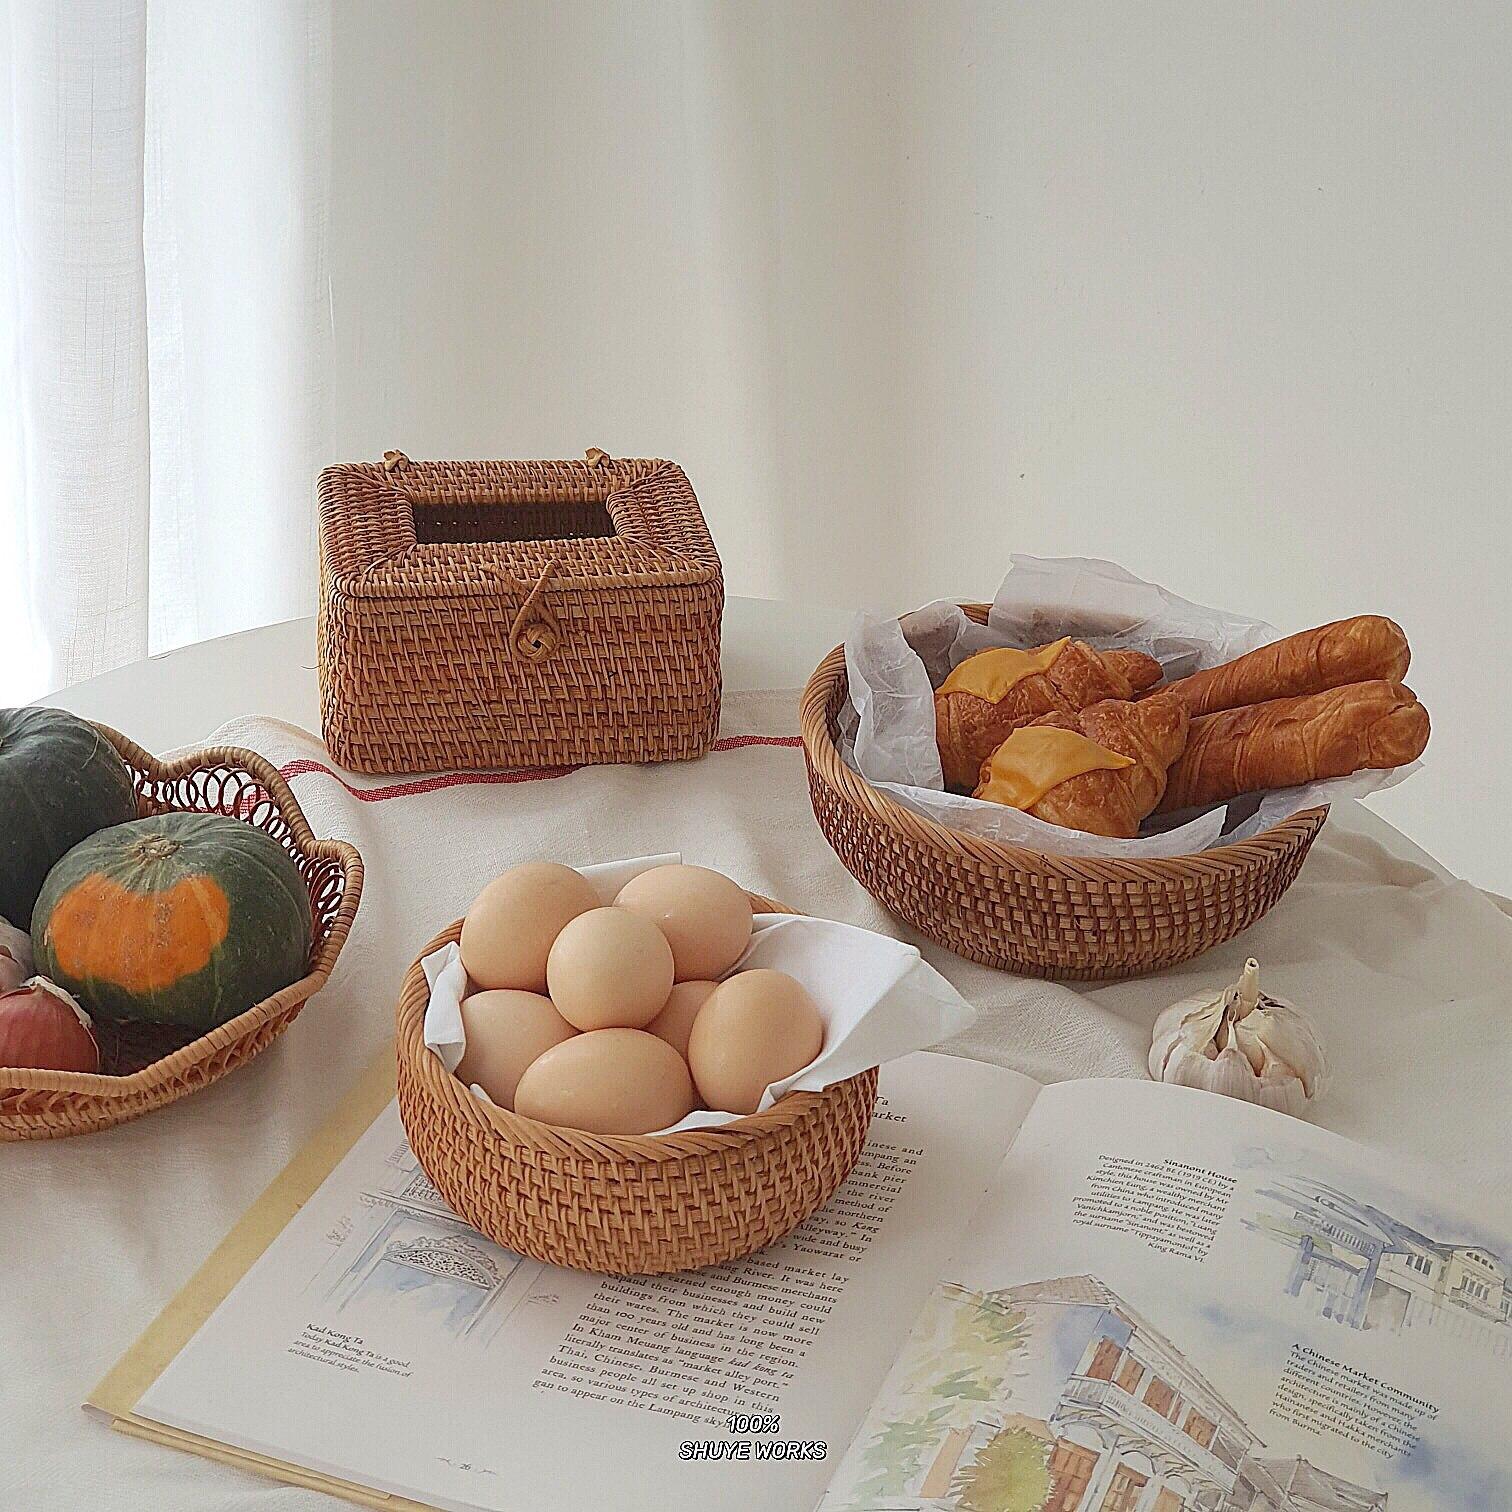 Hand-Woven Wruit Basket Kitchen Vegetable egg Storage Basket Household Wicker Bread Basket Square Tissue Box